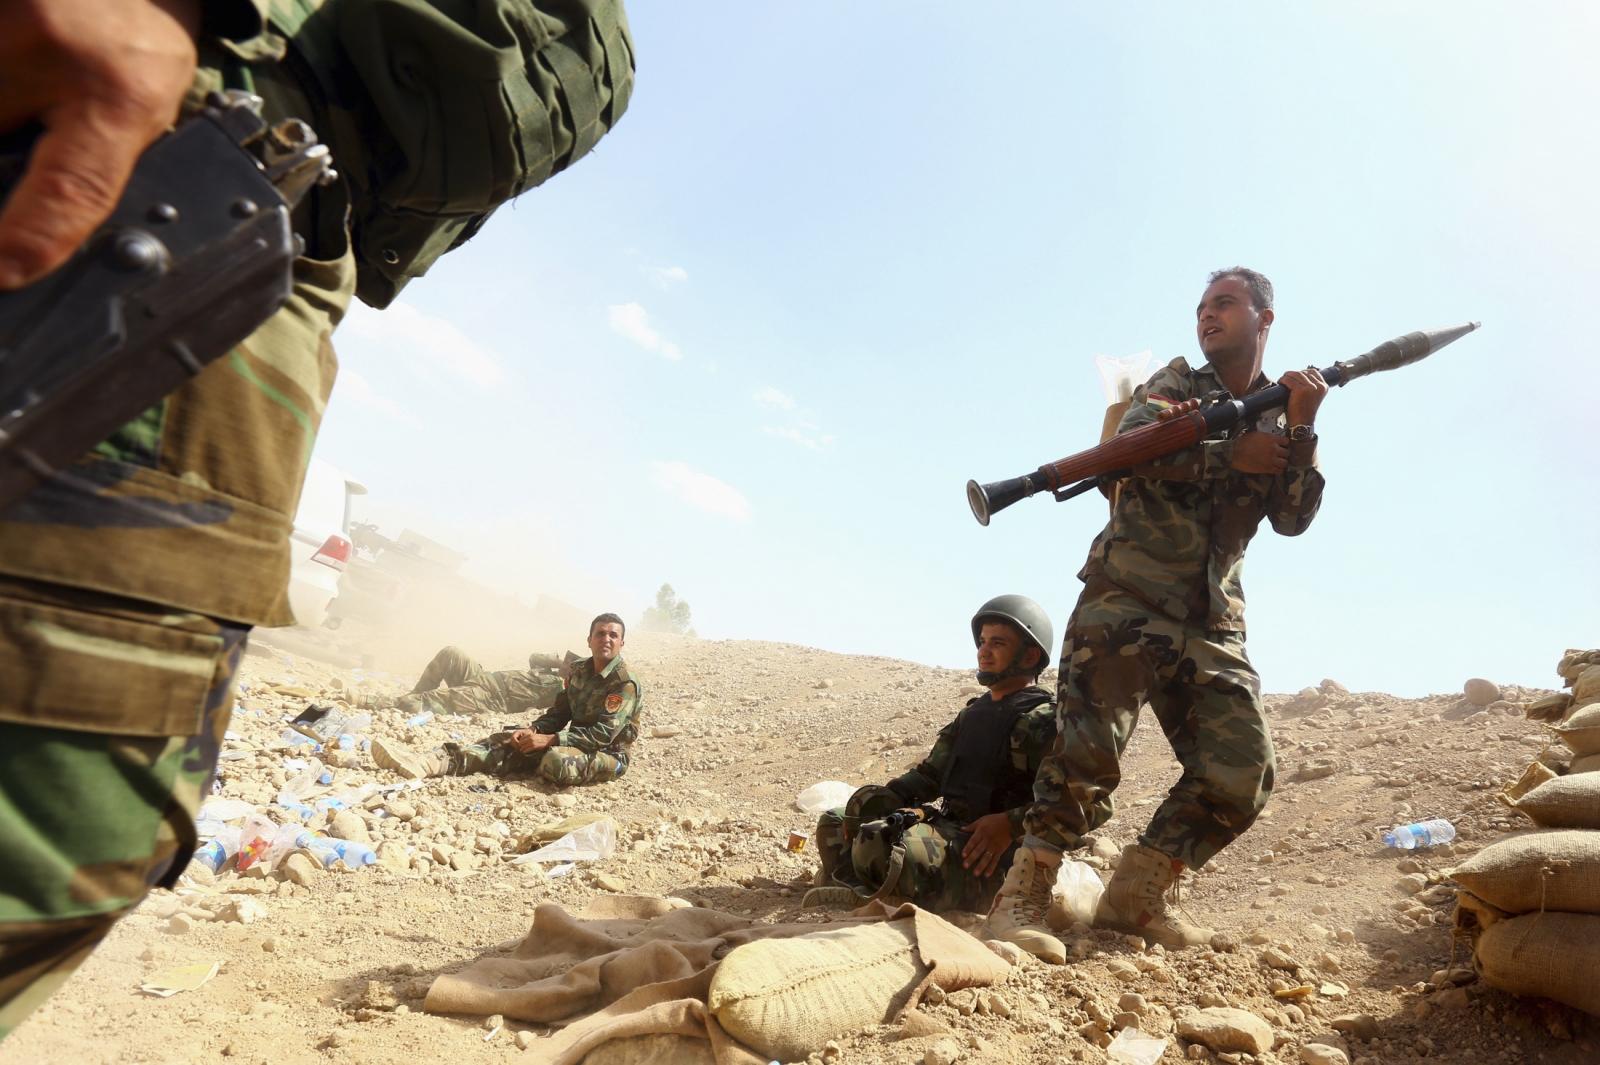 kurdish-peshmerga-troops-take-part-intensive-security-deployment-against-islamic-state.jpg